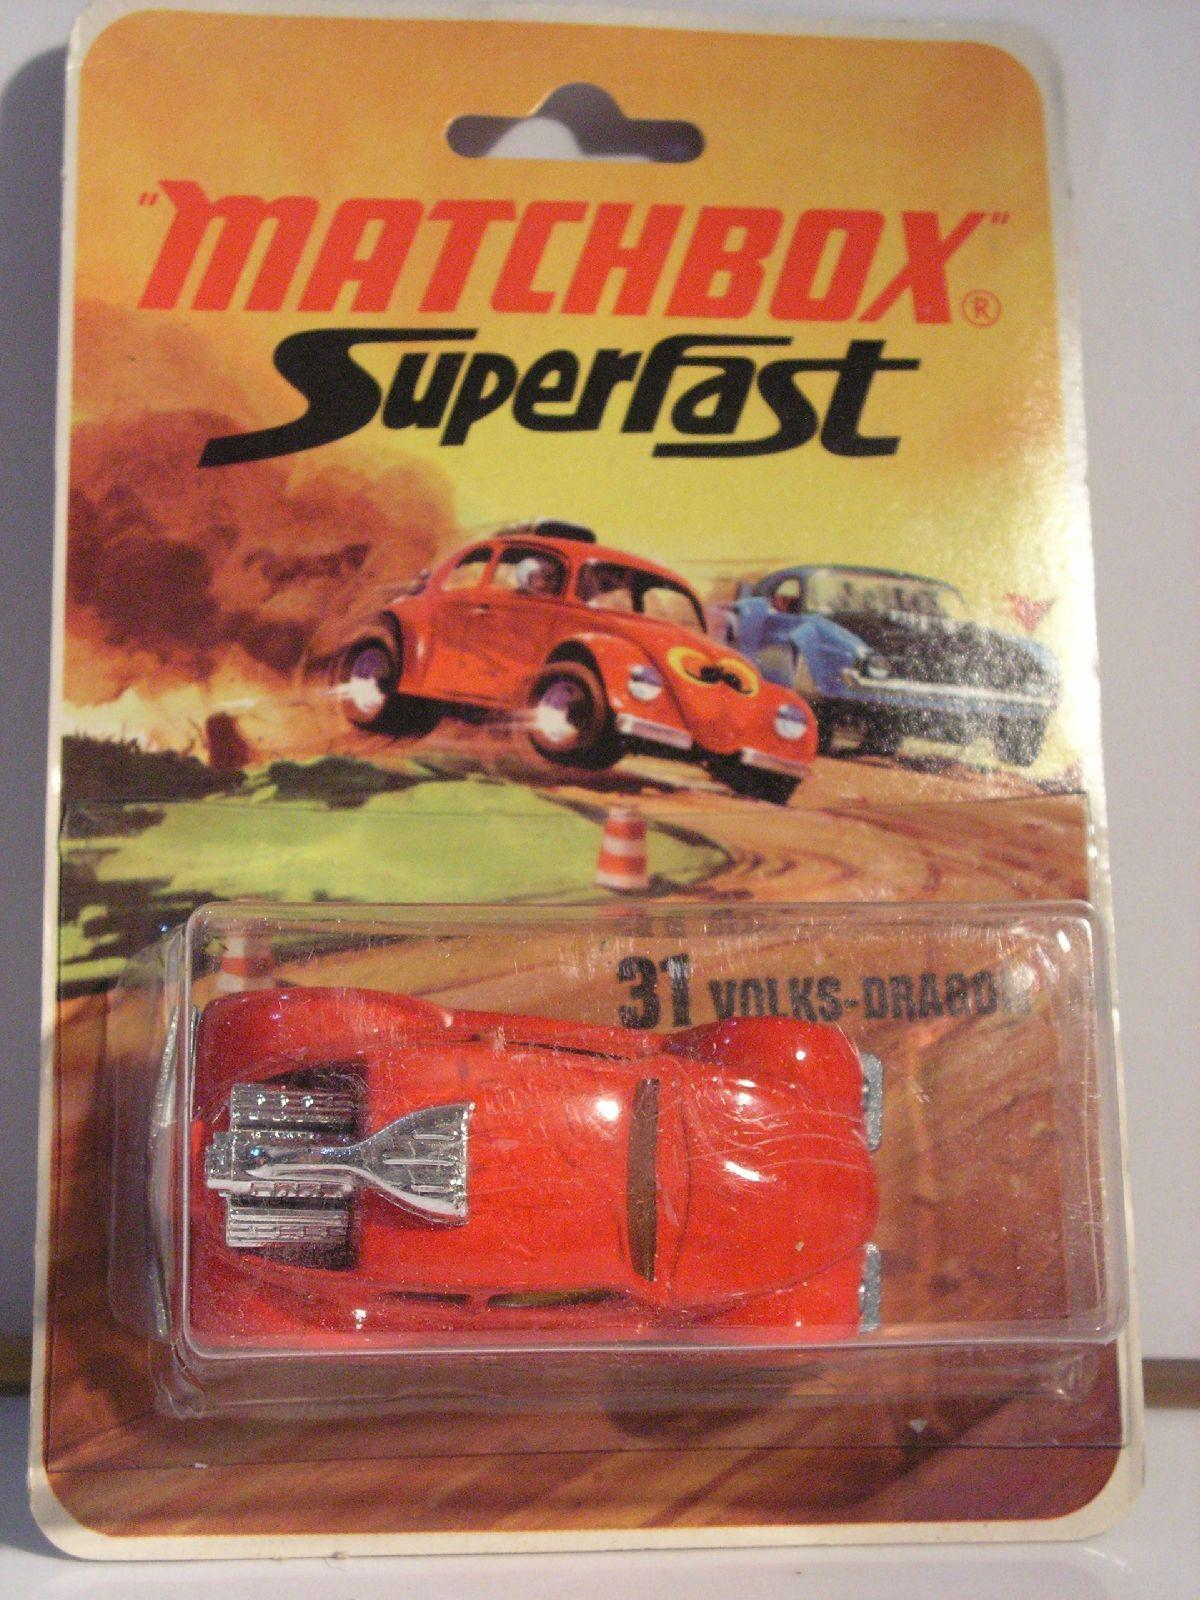 MATCHBOX  VOLKS-DRAGON - 31 MIB NEUF BOITE súperFAST vw beetle cox